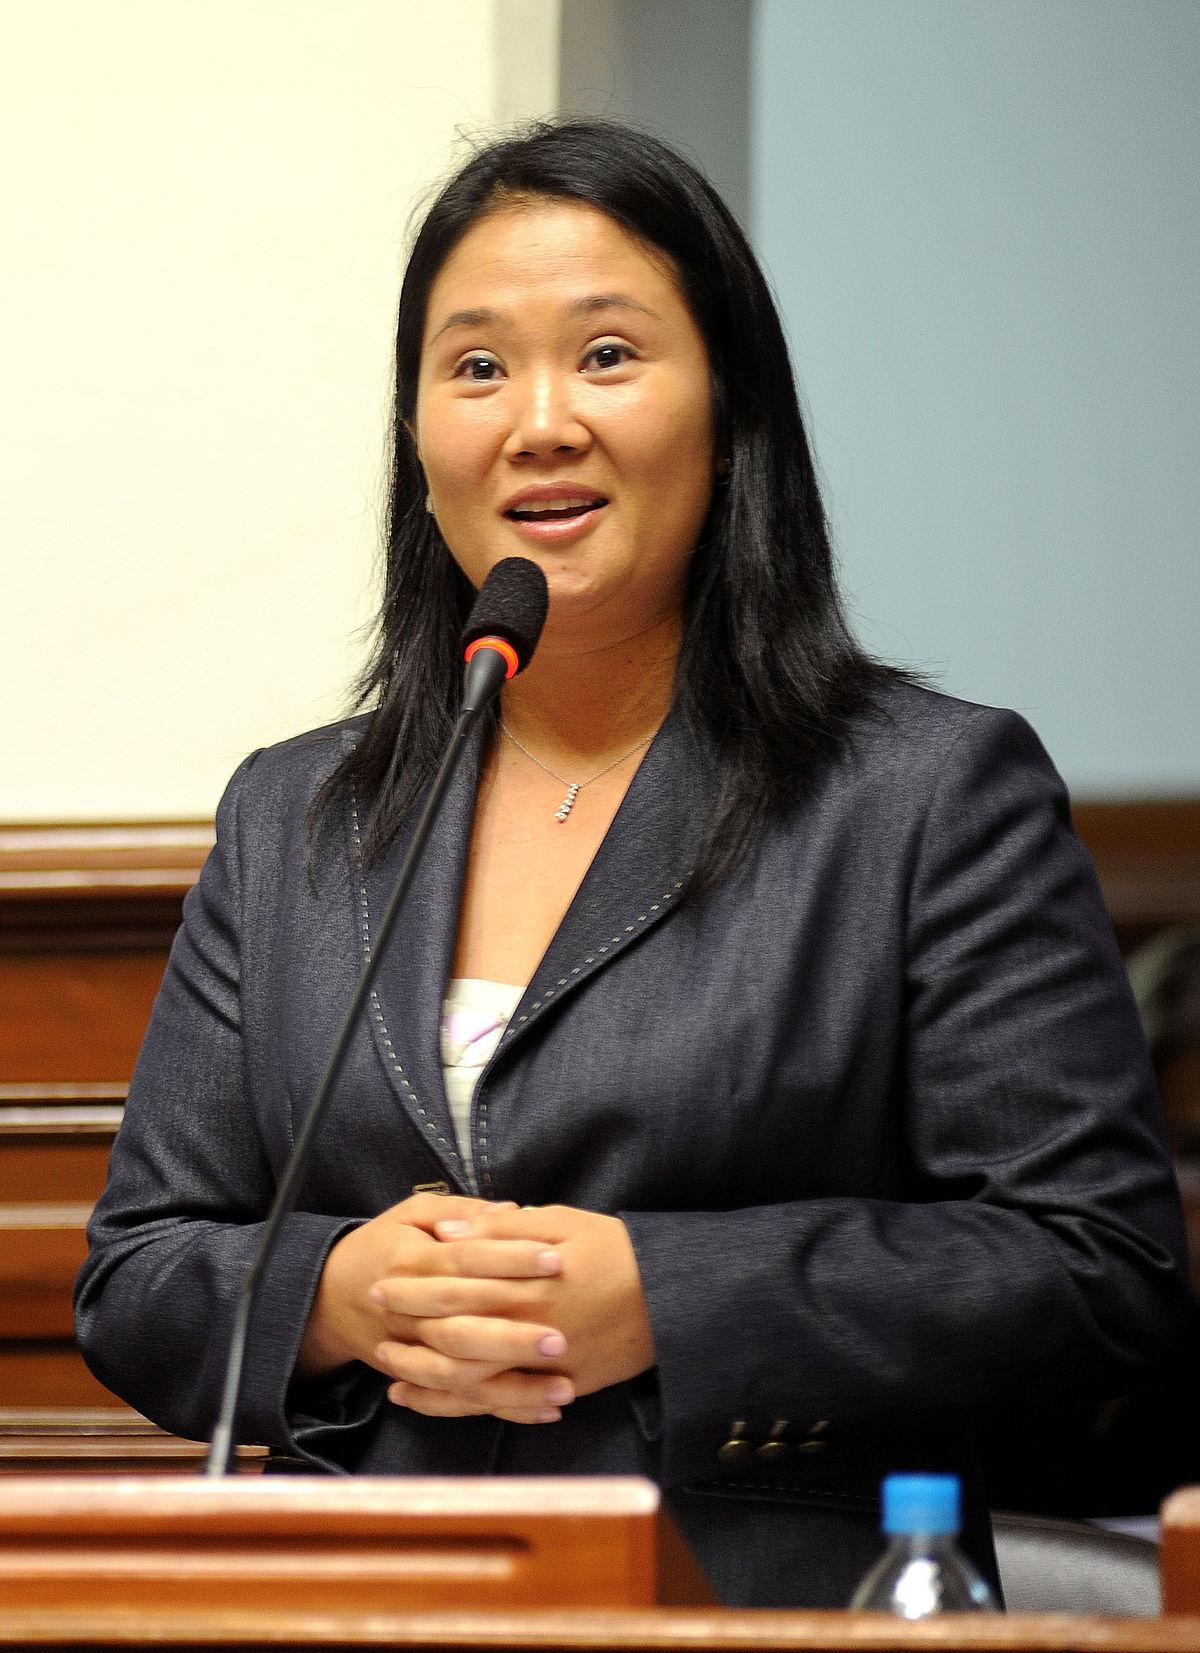 Keiko Fujimori, presidenta del partido fuerza popular